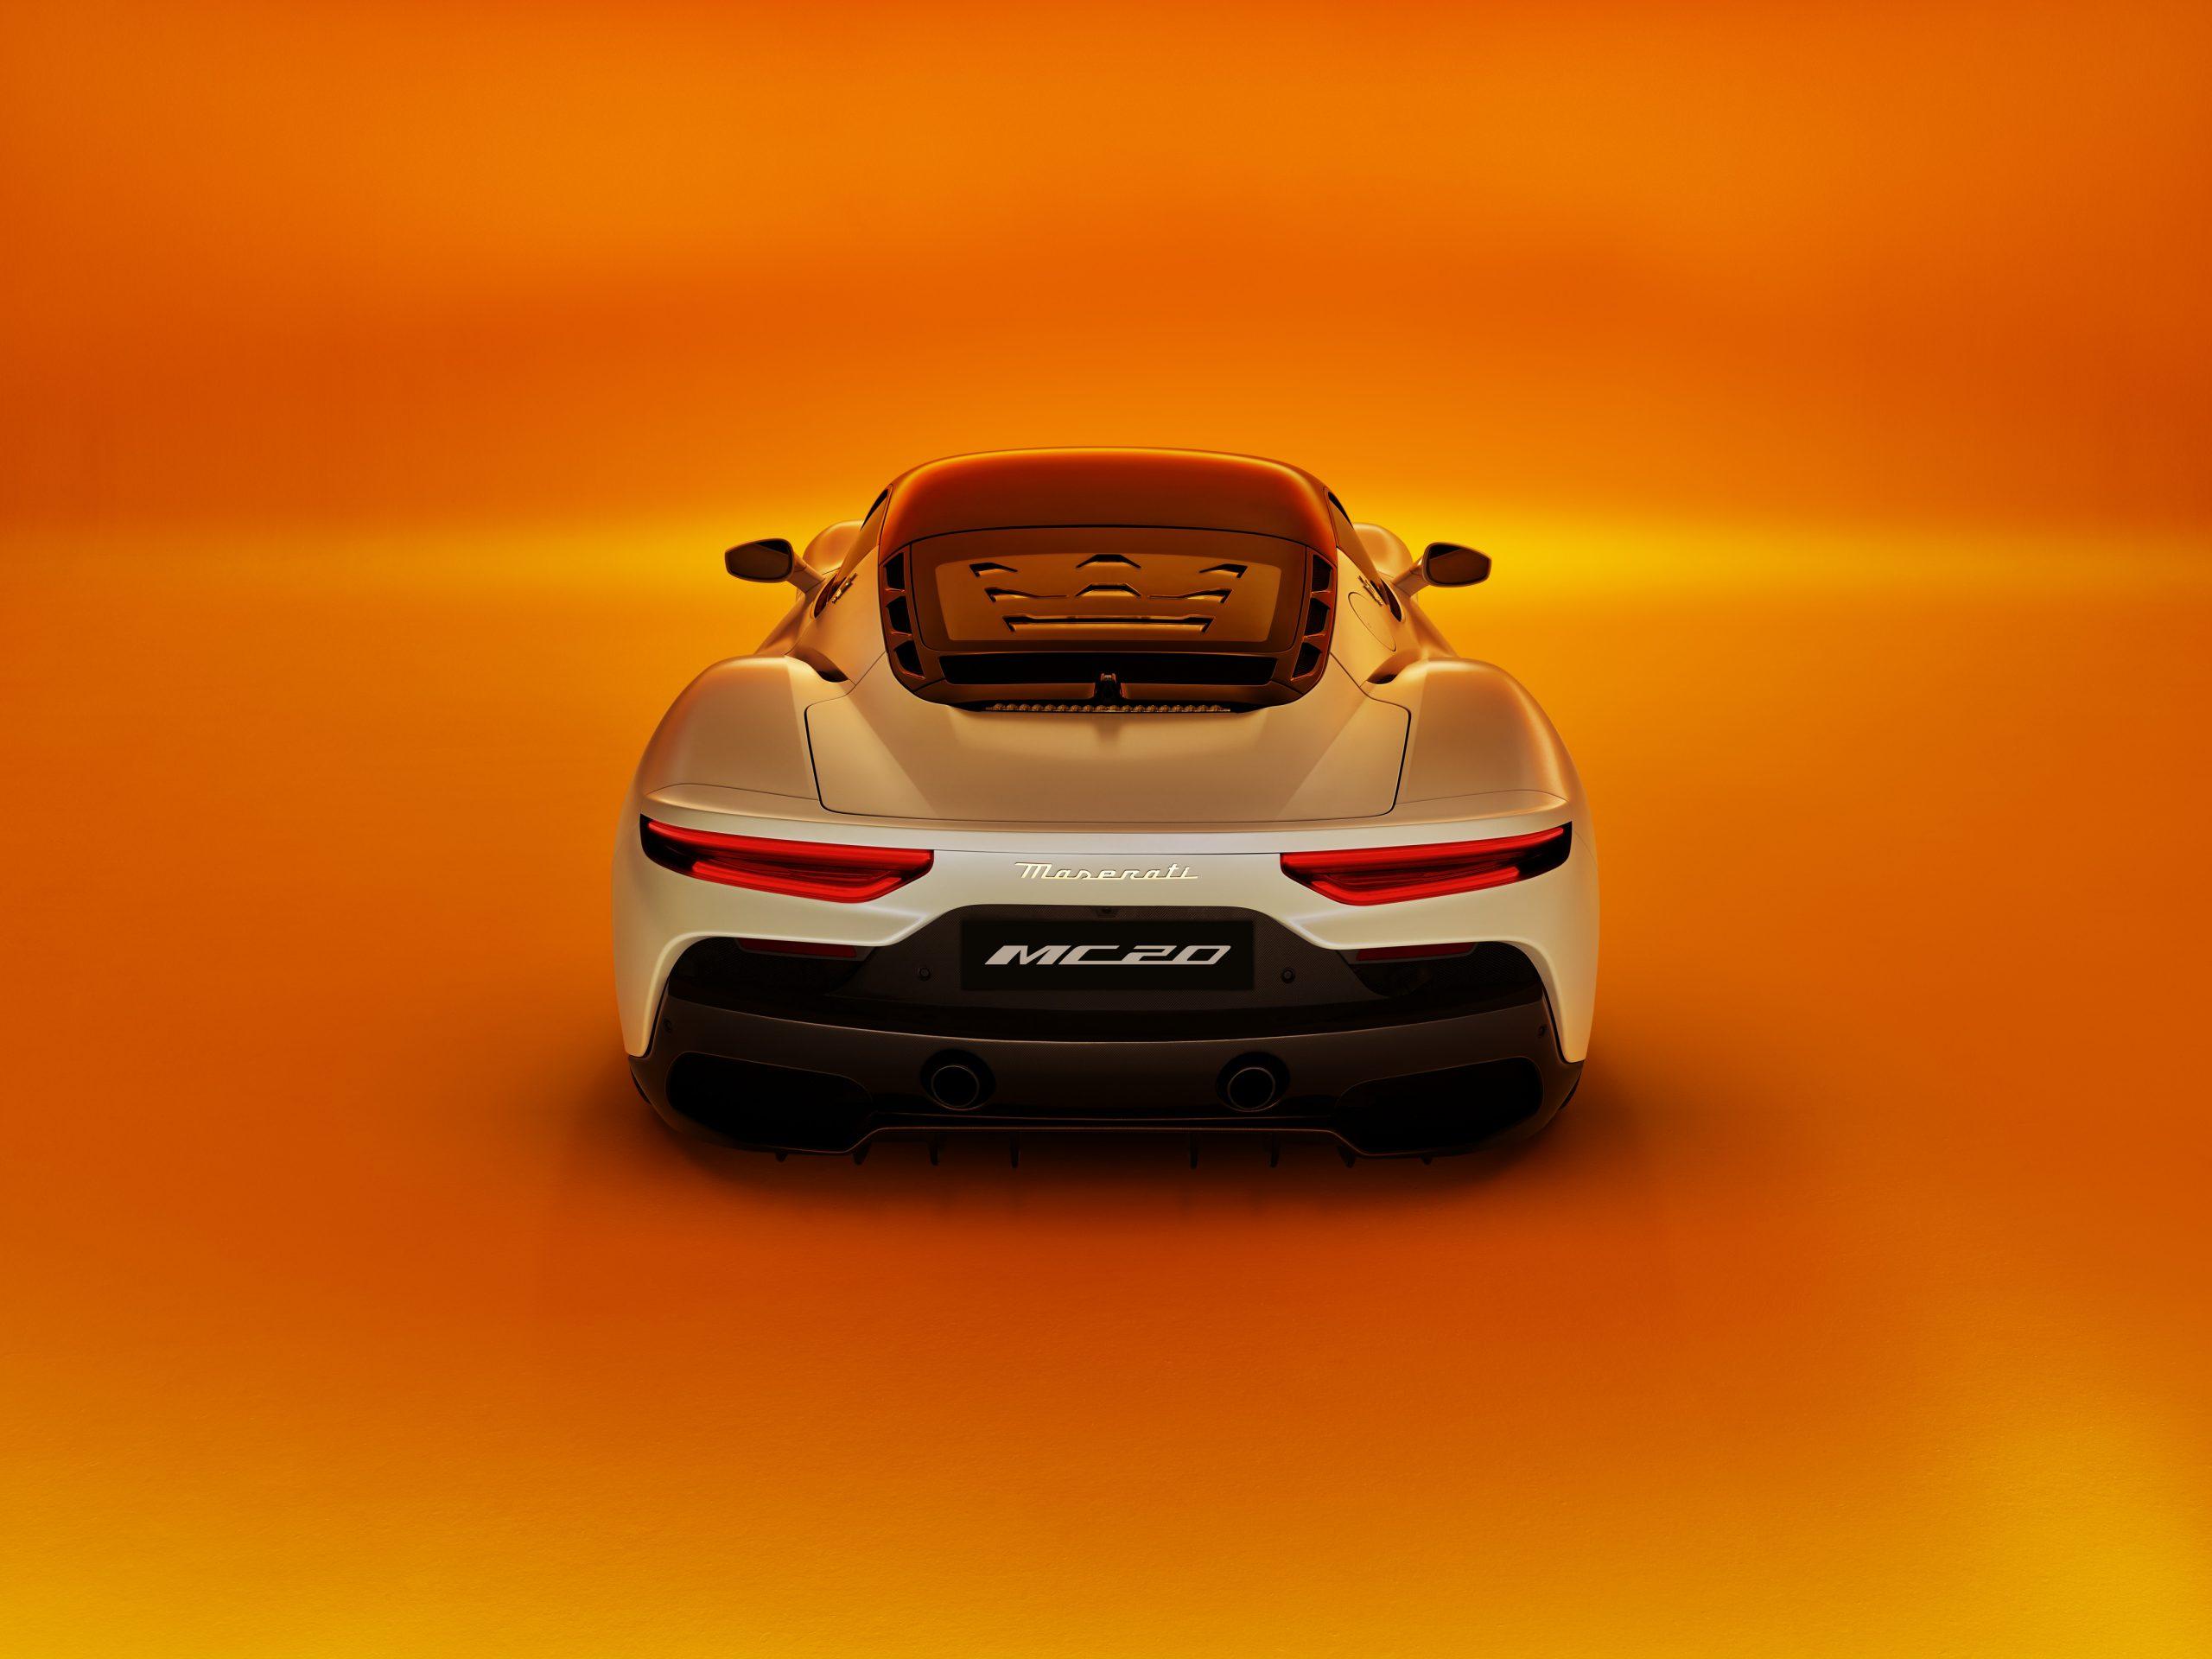 Maserati MC20 rear orange